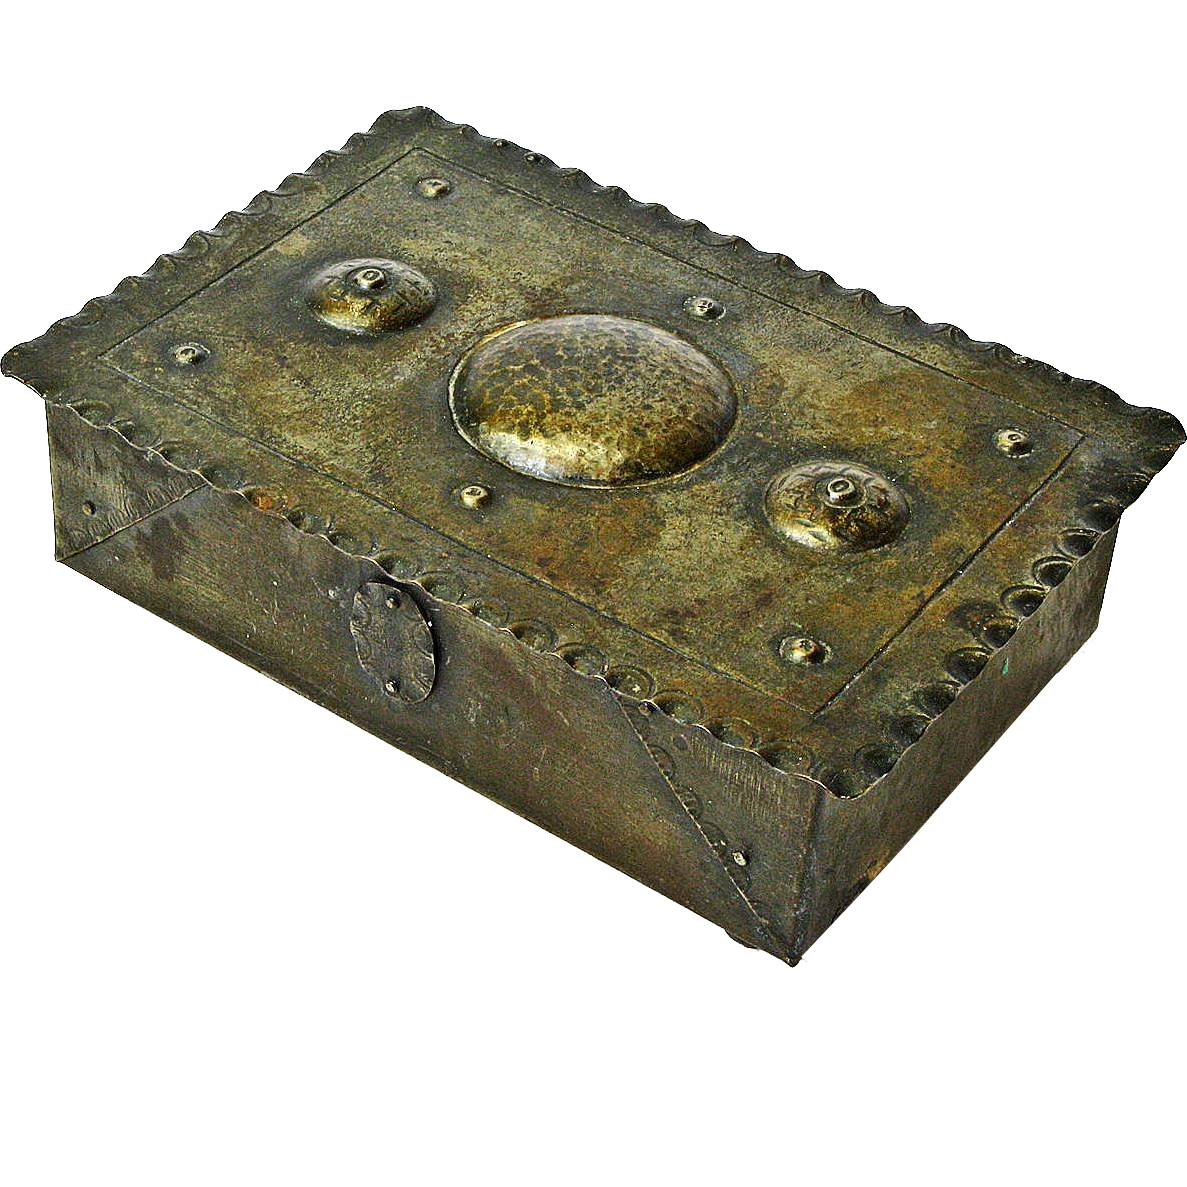 Signed Goberg Hand Hammered Iron Decorative Lined Desk Box Humidor, Ca. 1900-10